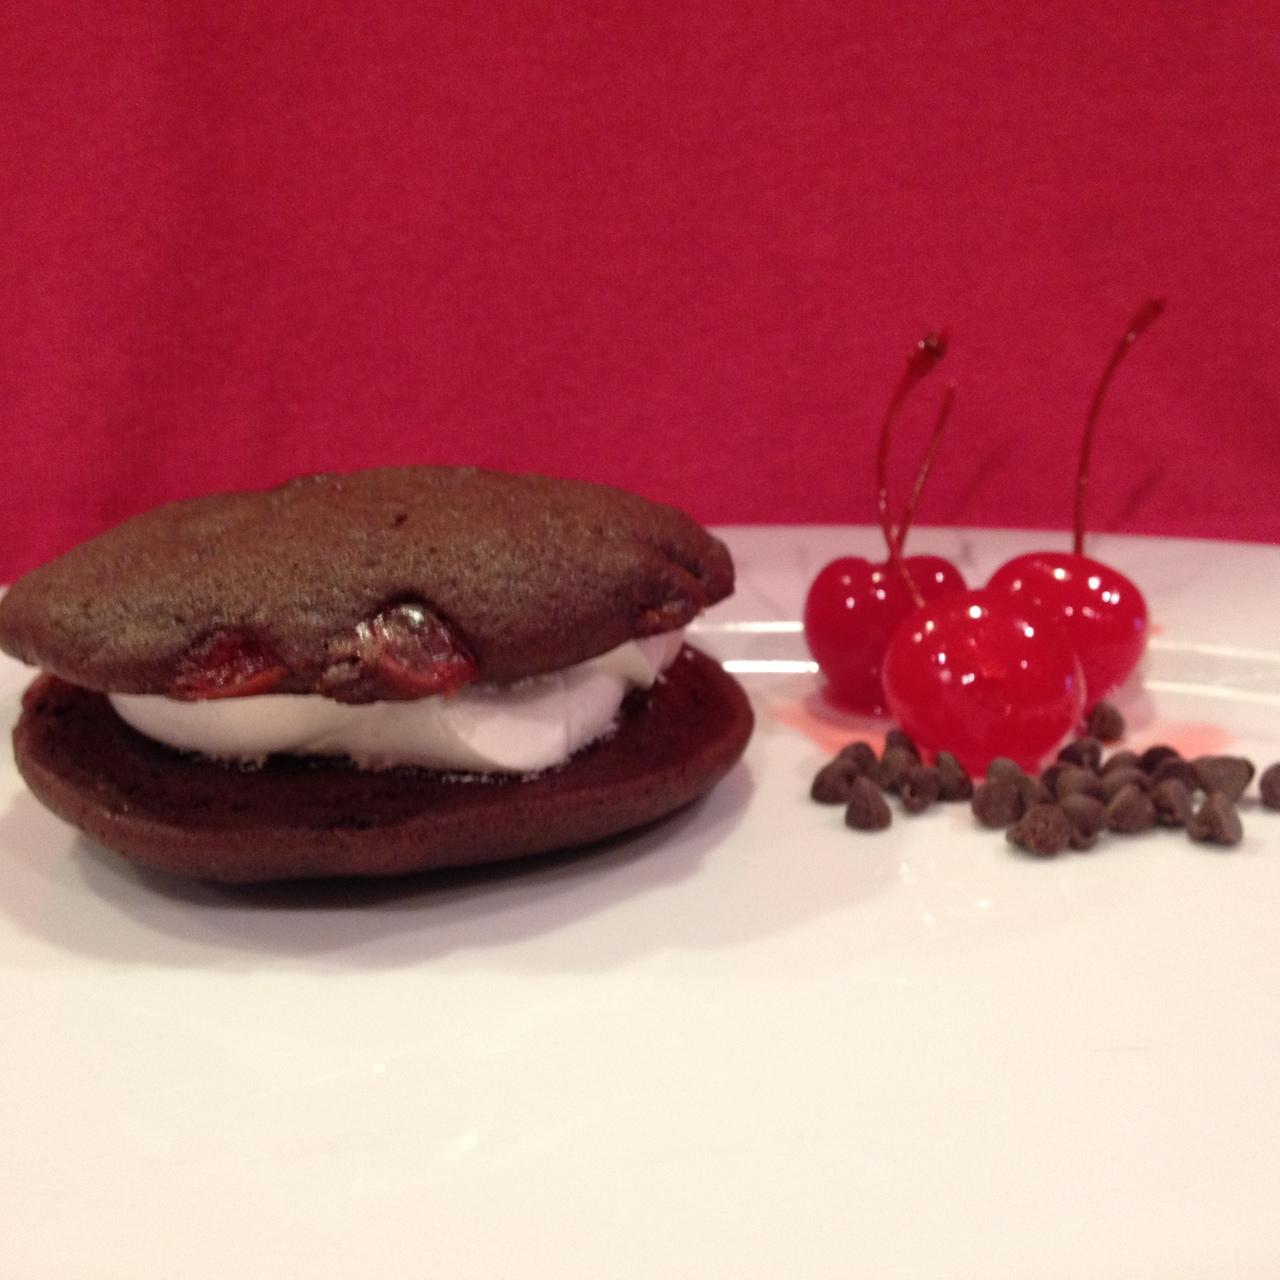 12 Pack Medium Chocolate Cherry Whoopie Pies Birthday Party Size